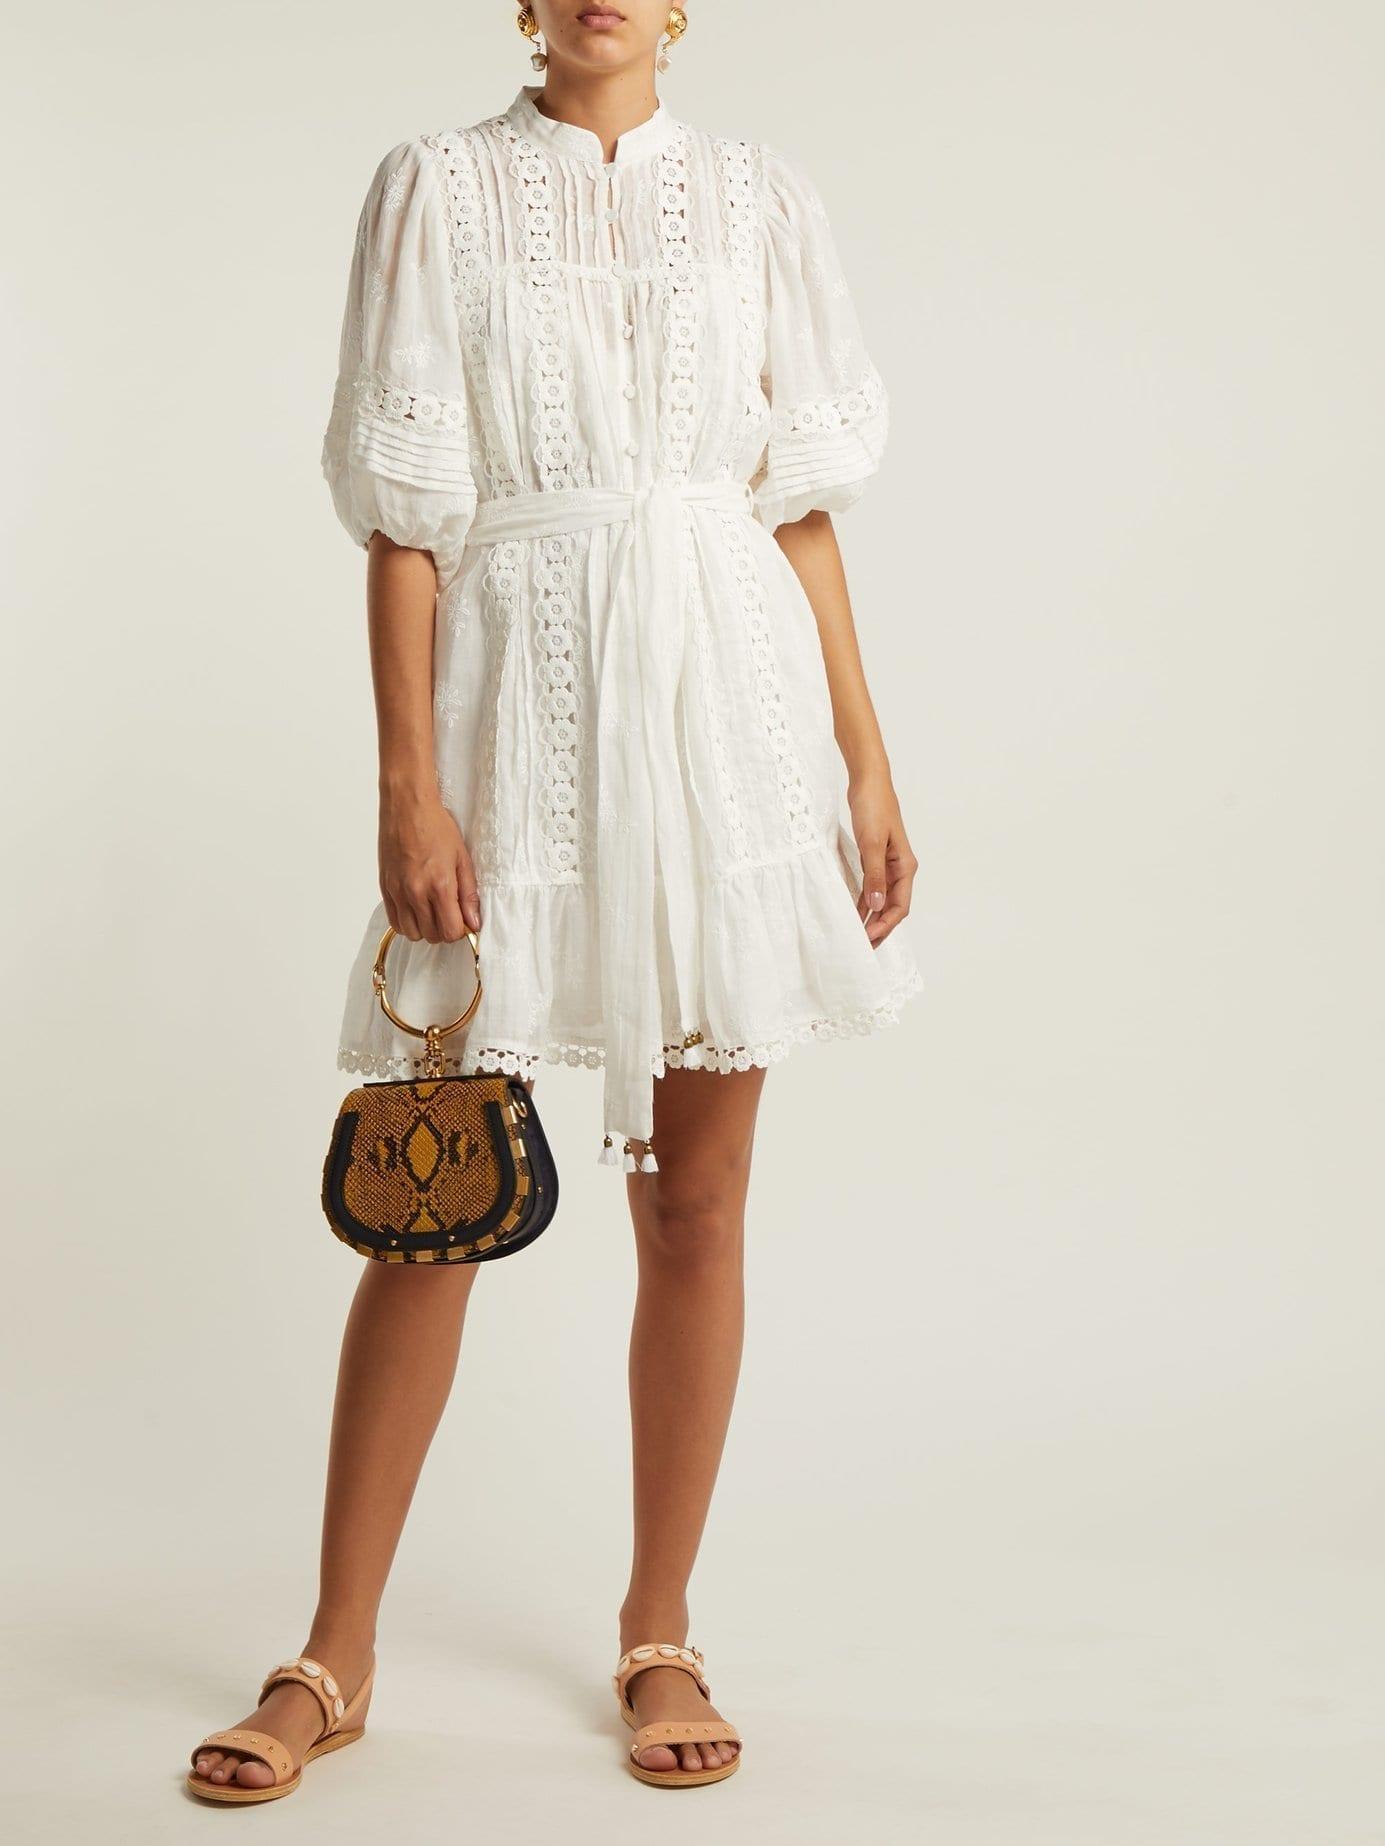 Zimmermann Castile Flower Lace Trimmed Voile White Dress